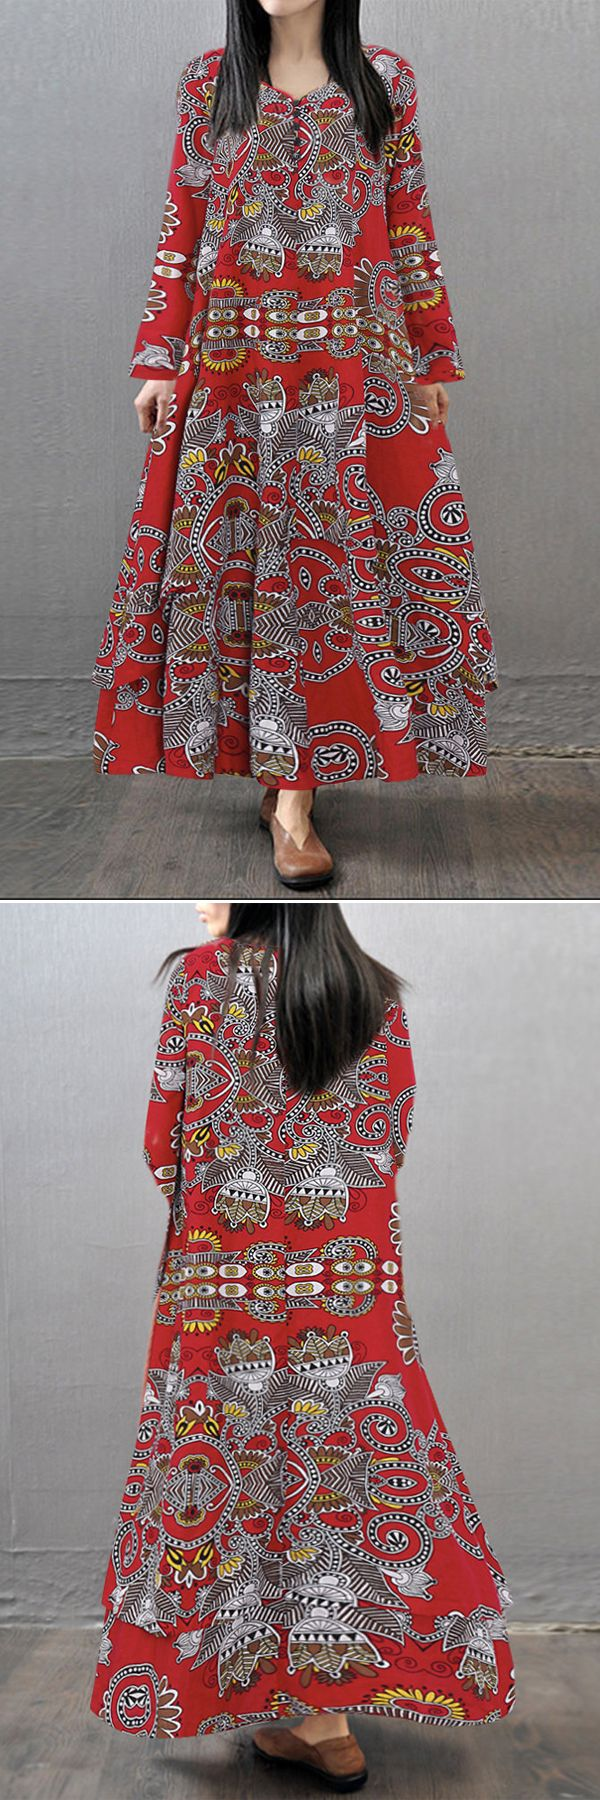 Gracila Women Printed V-neck Long Sleeve Maxi Vintage Dresses